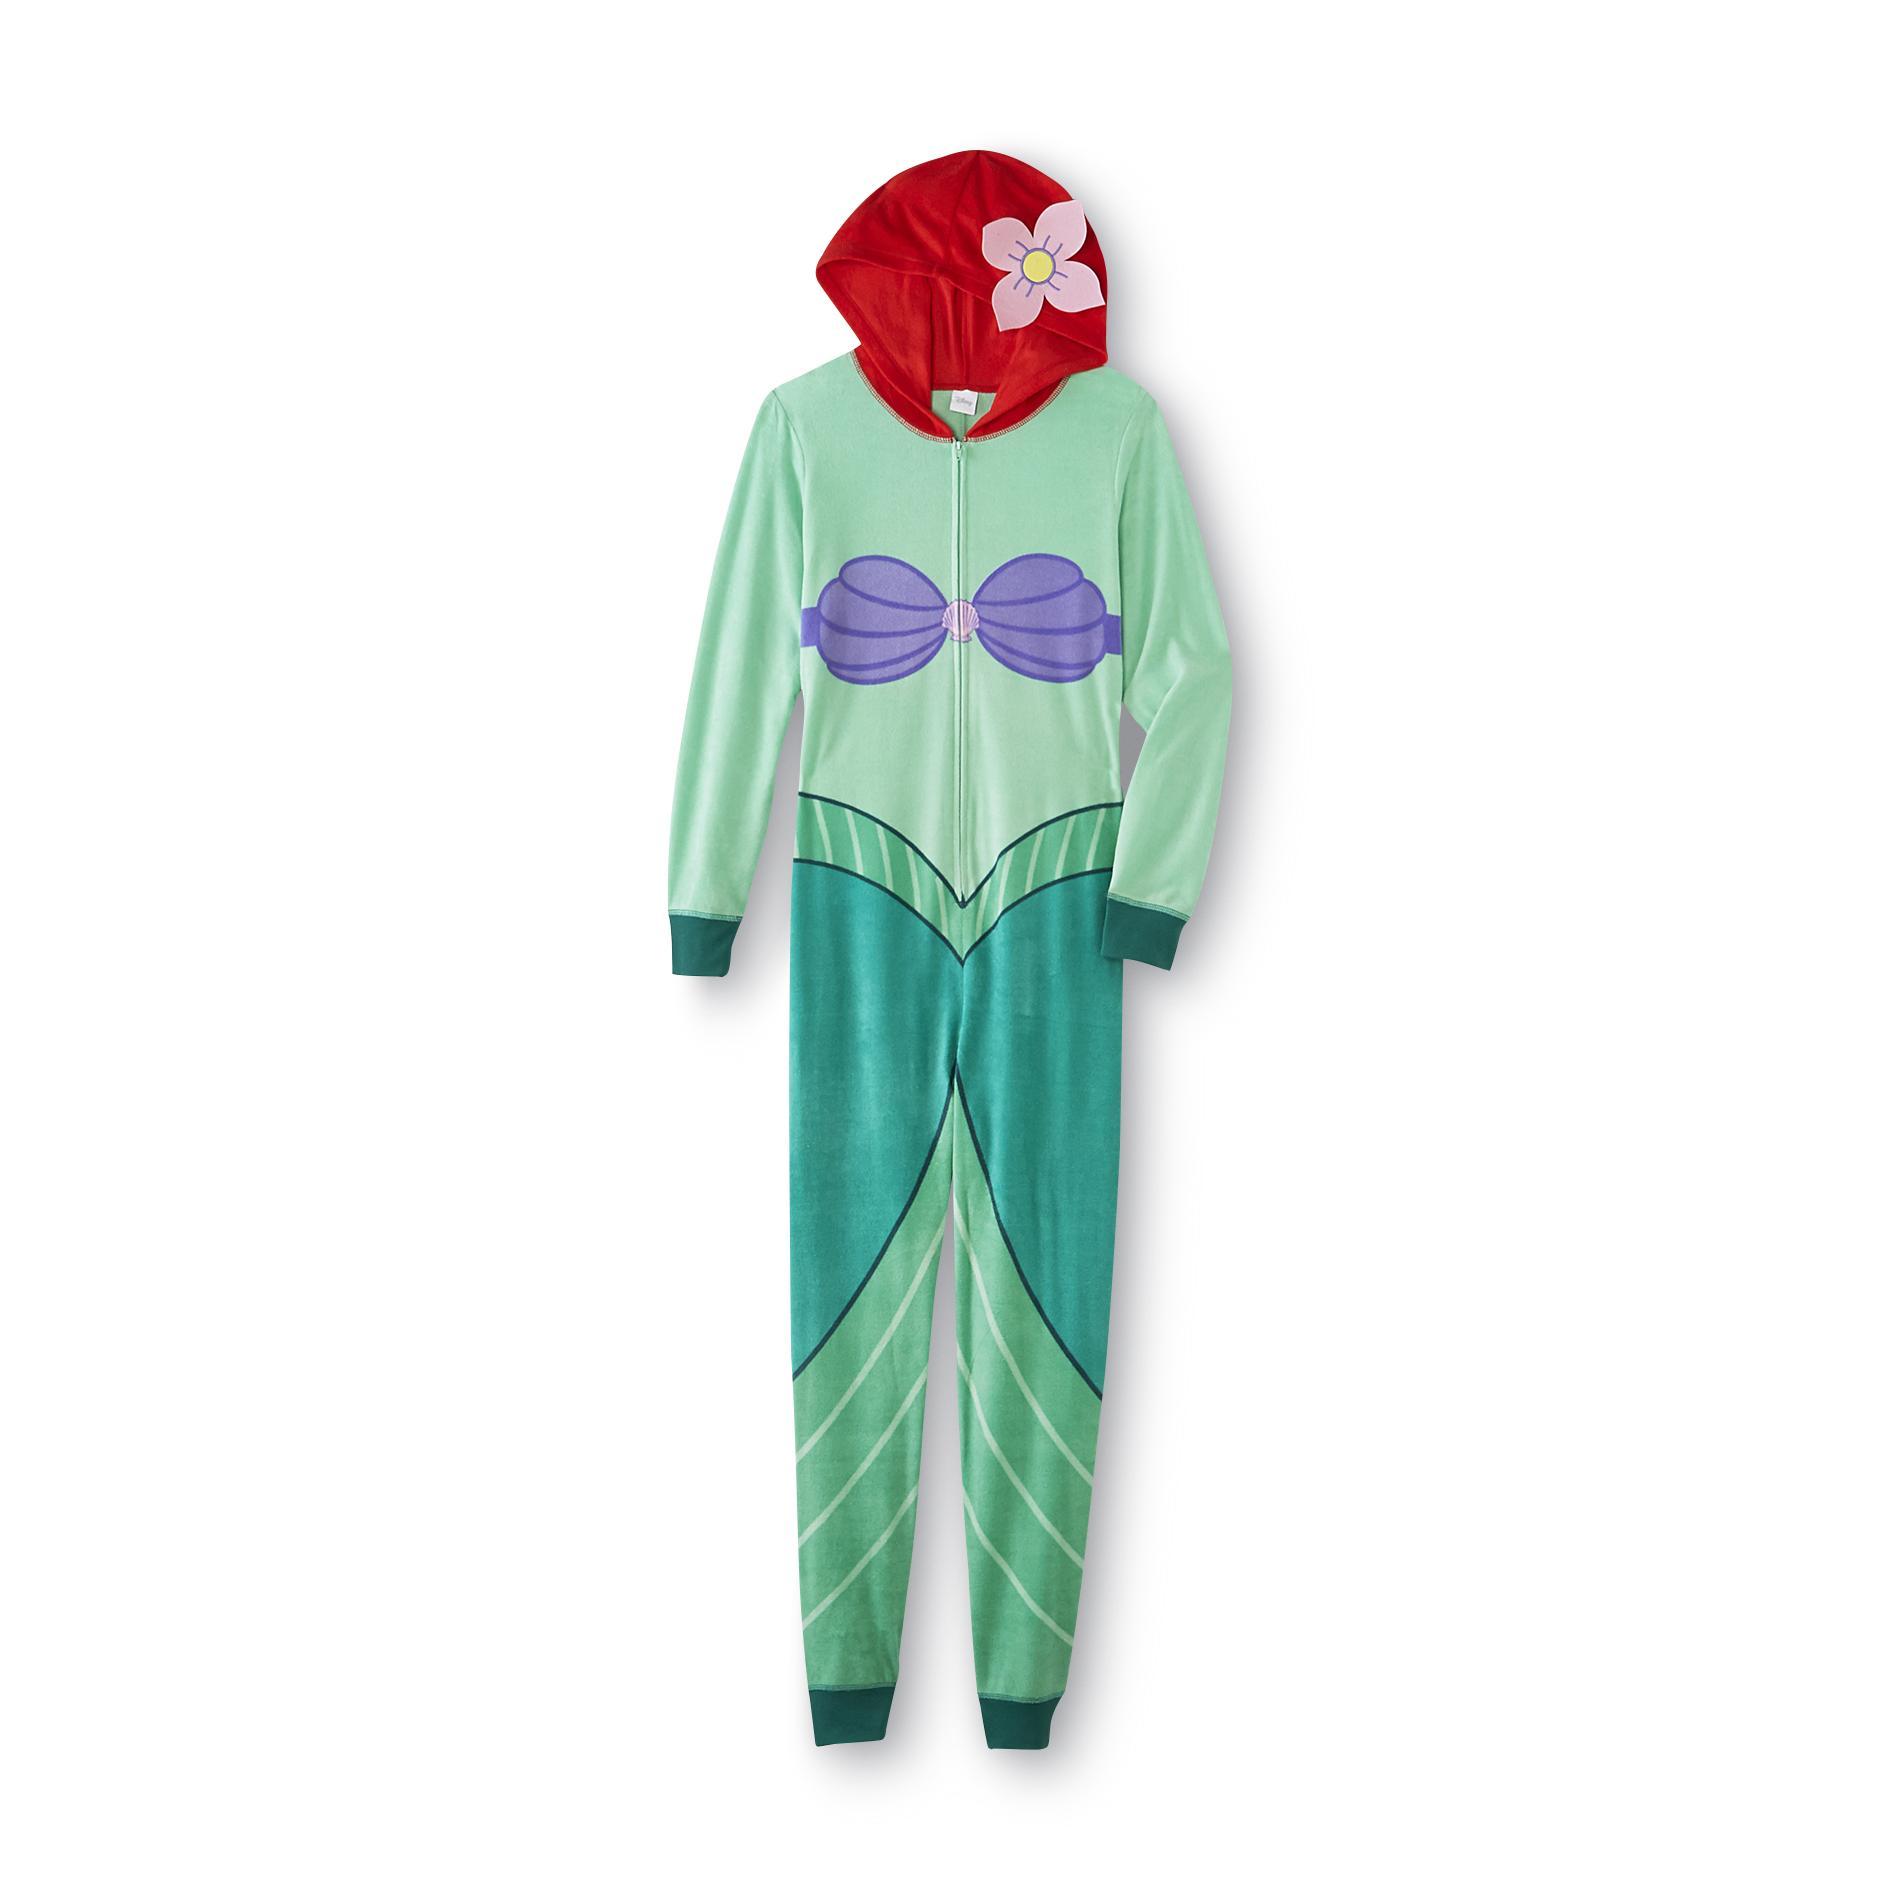 Disney The Little Mermaid Womens One Piece Pajamas